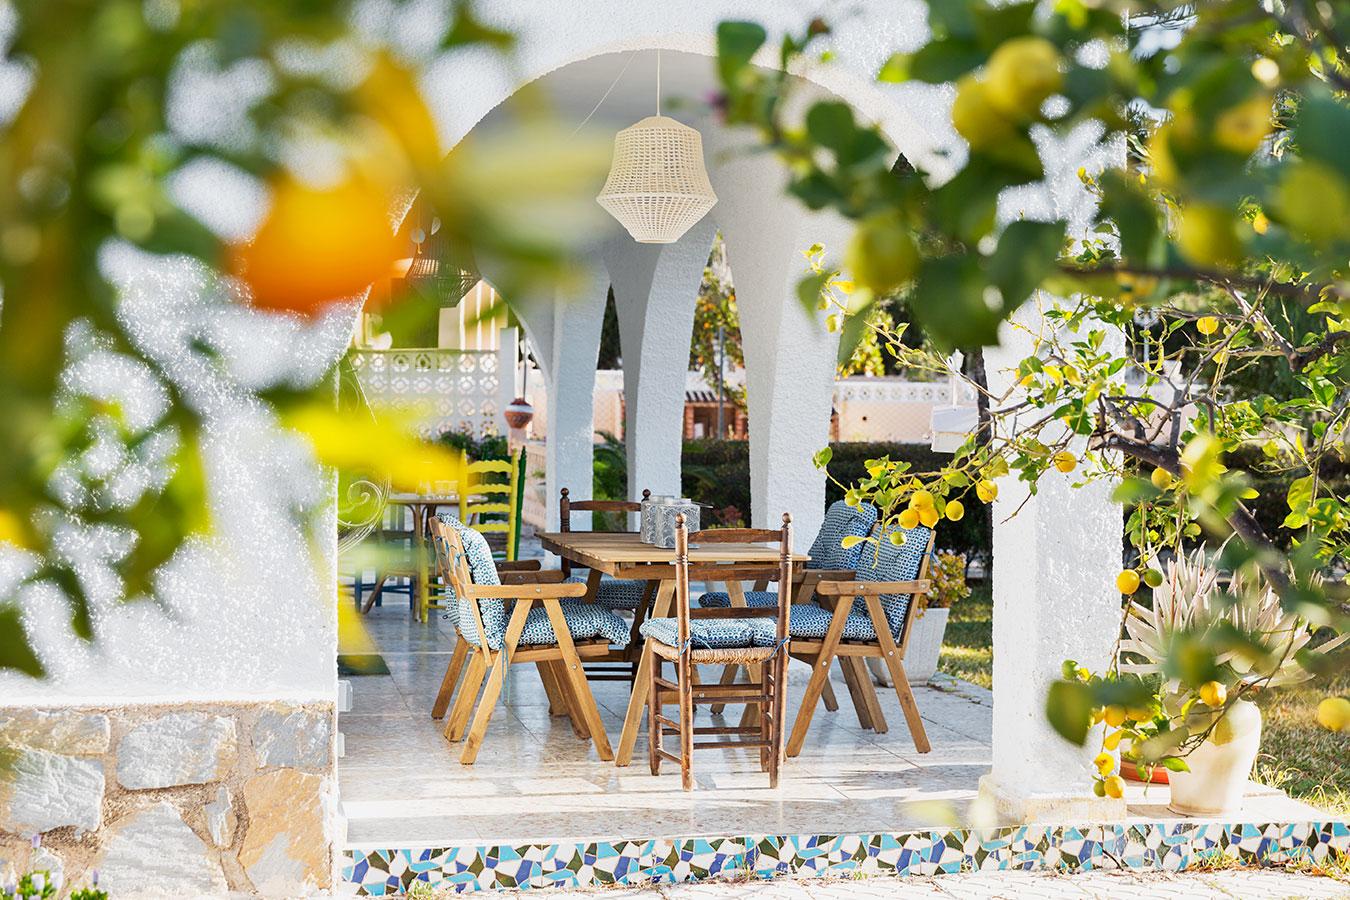 http://cremefresh.at/wp-content/uploads/2019/11/Casa_Alicante009.jpg